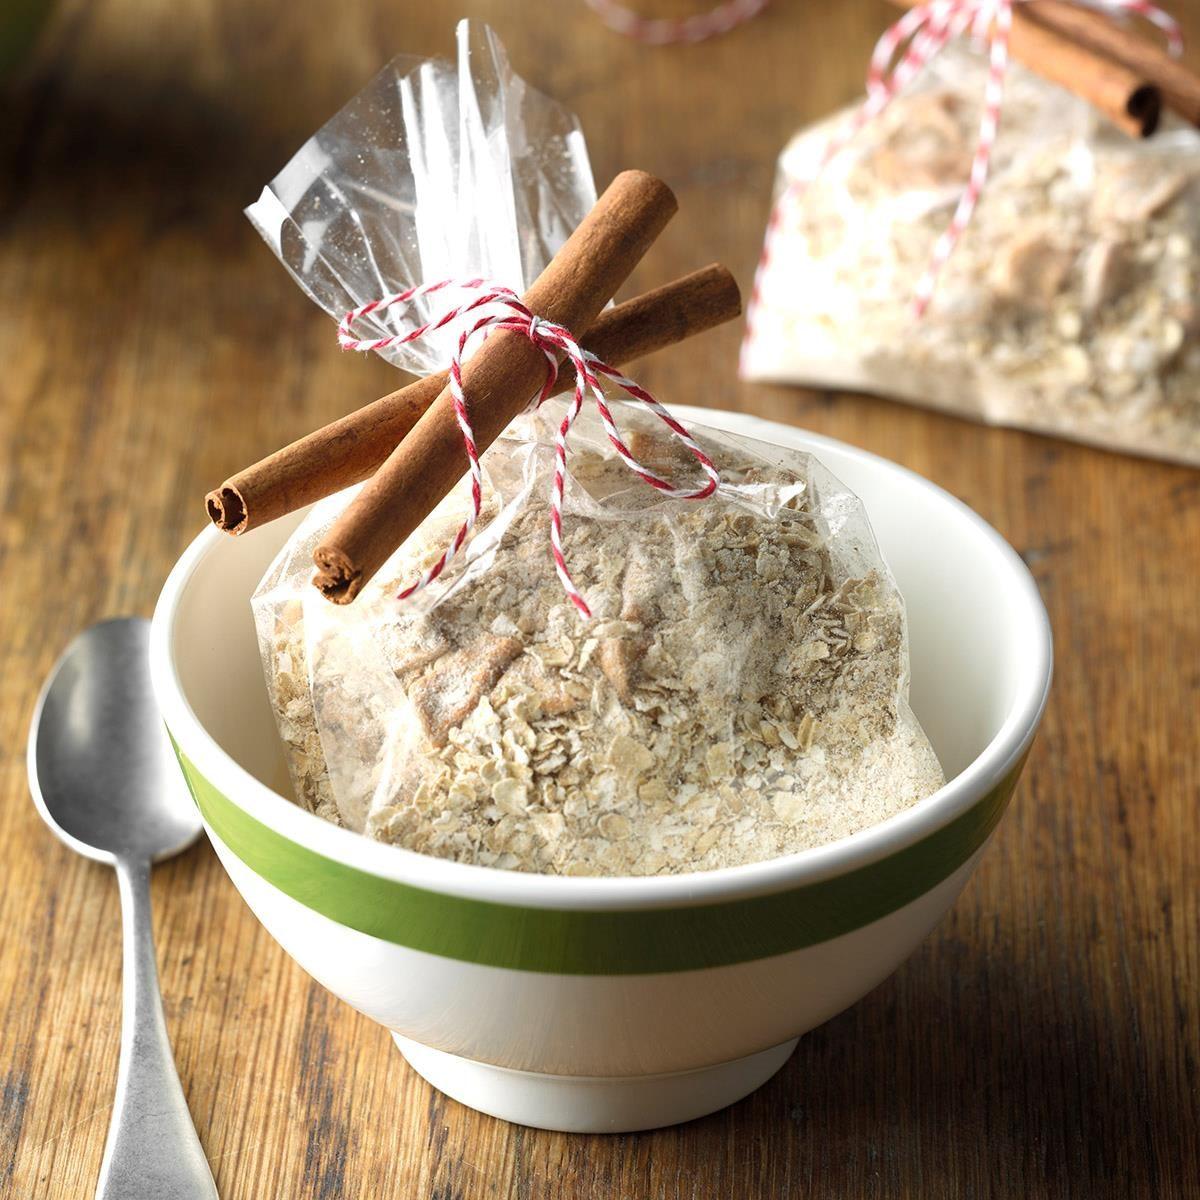 Apple-Cinnamon Oatmeal Mix Recipe